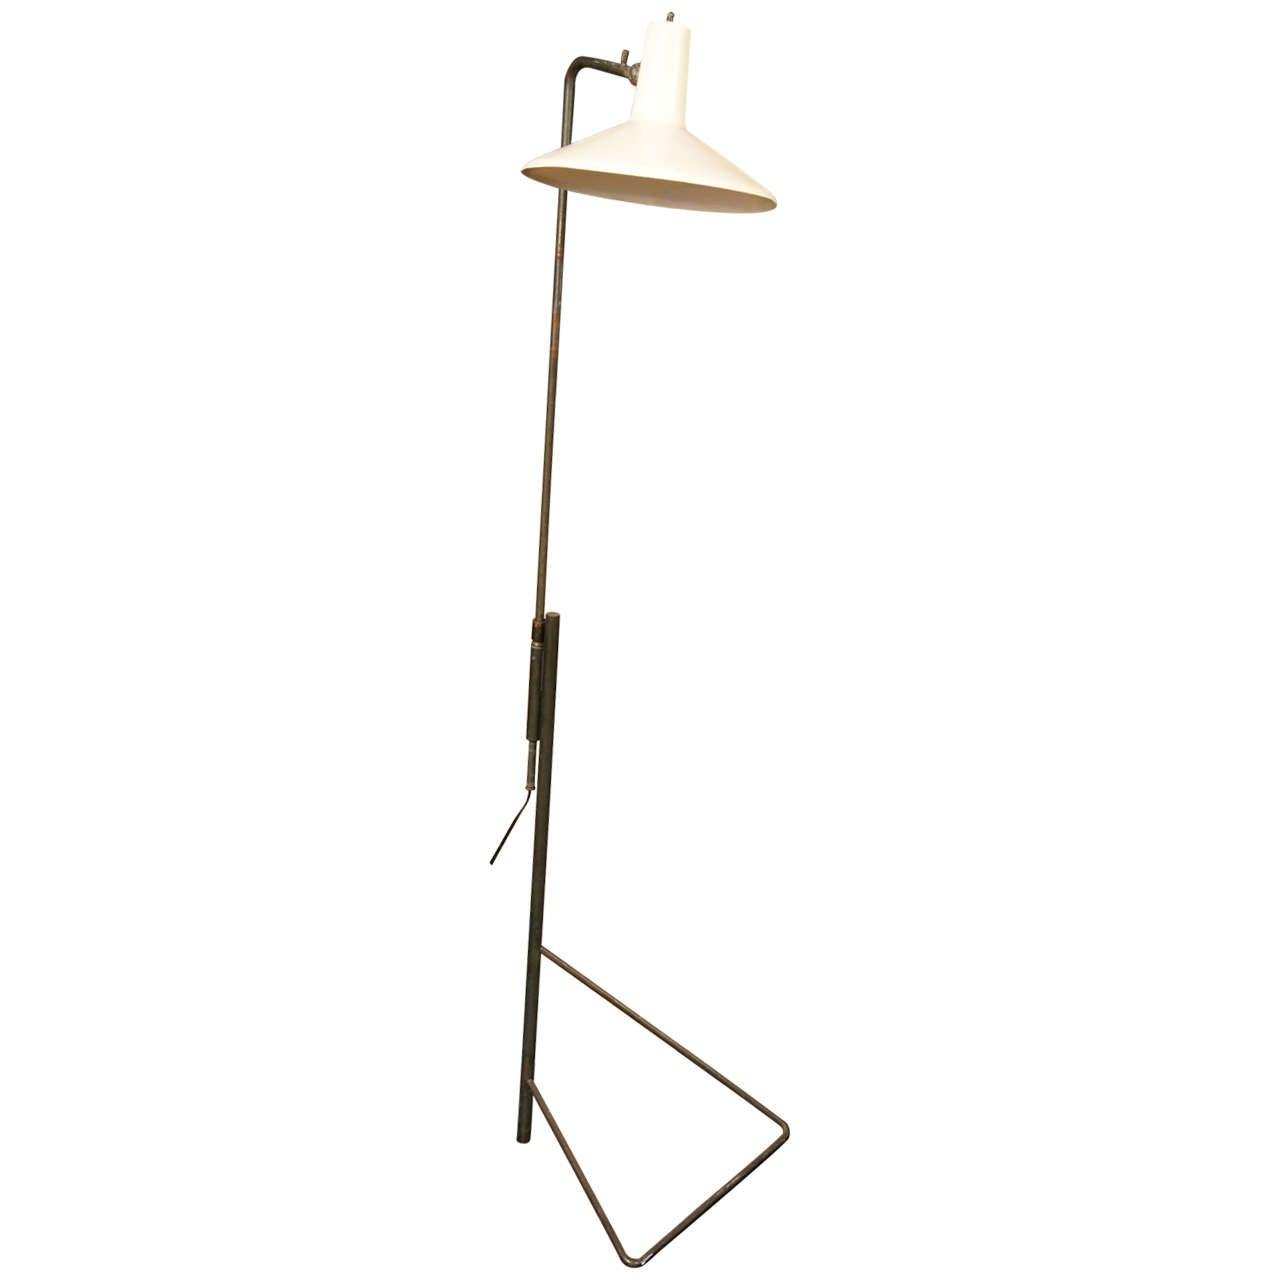 Adjustable Knoll Floor or Wall Lamp at 1stdibs